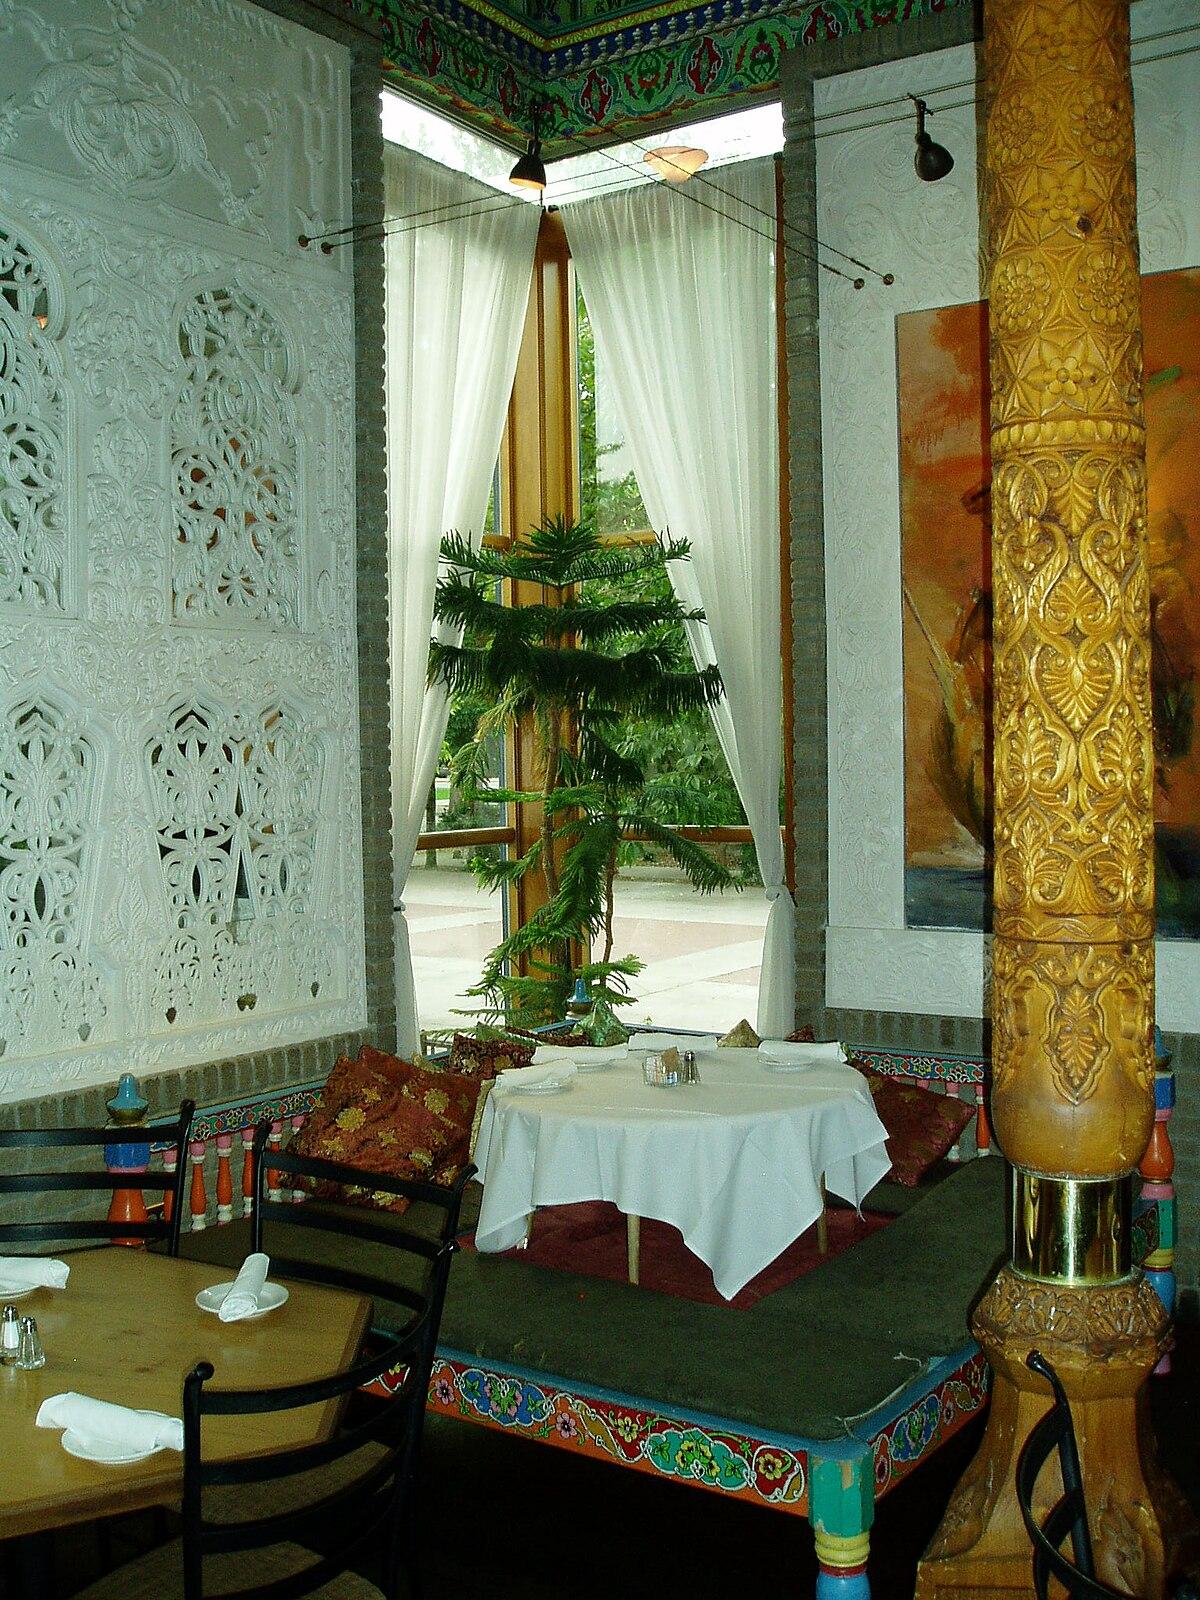 Decoration Image